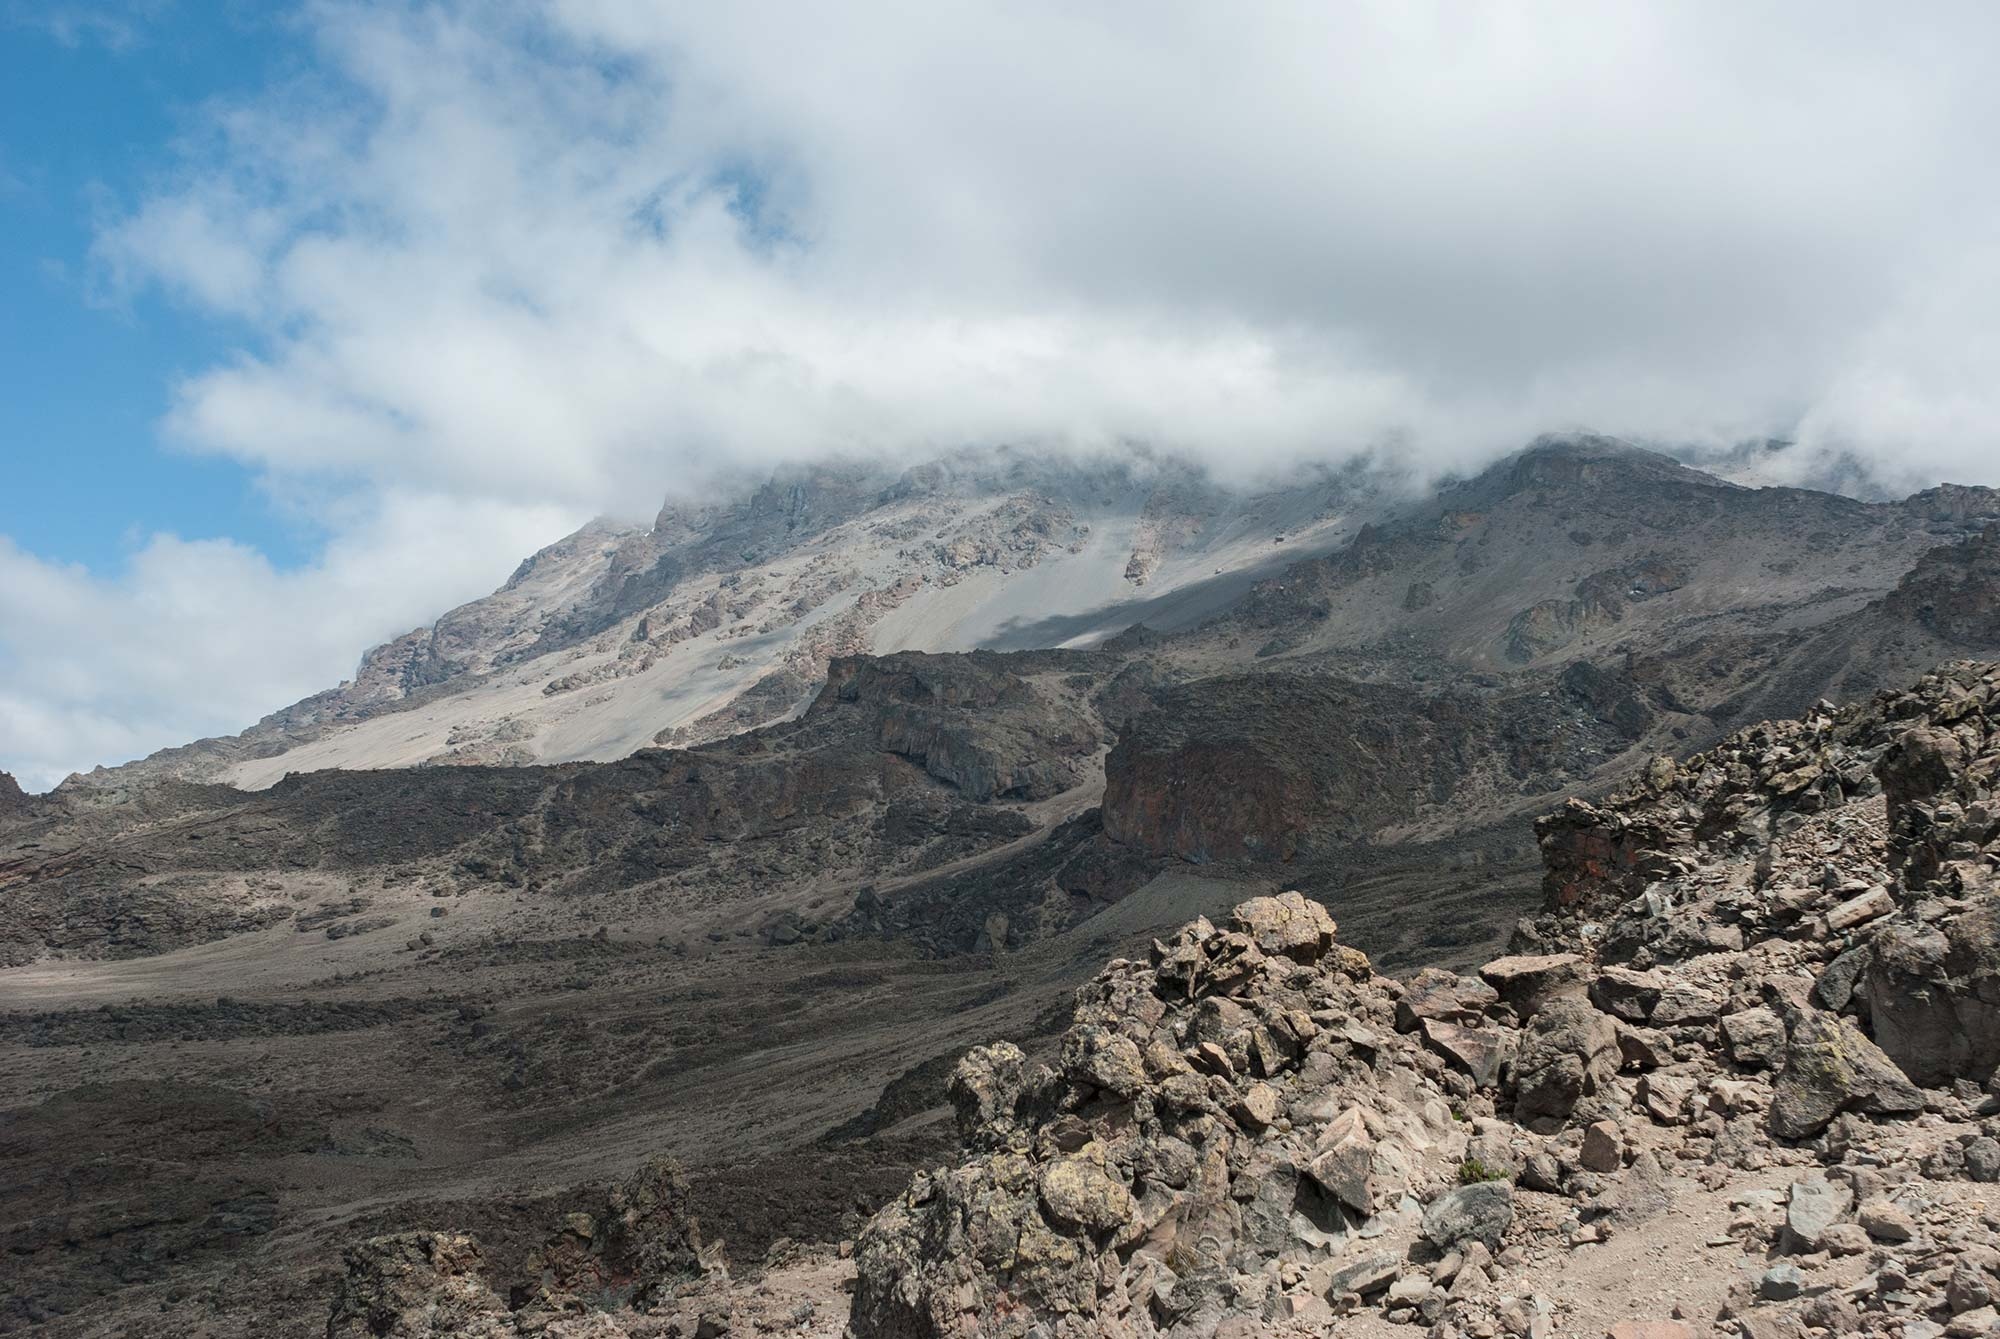 D6-36-mountain-weather-karanga-to-barufu-camp-kilimanjaro.jpg